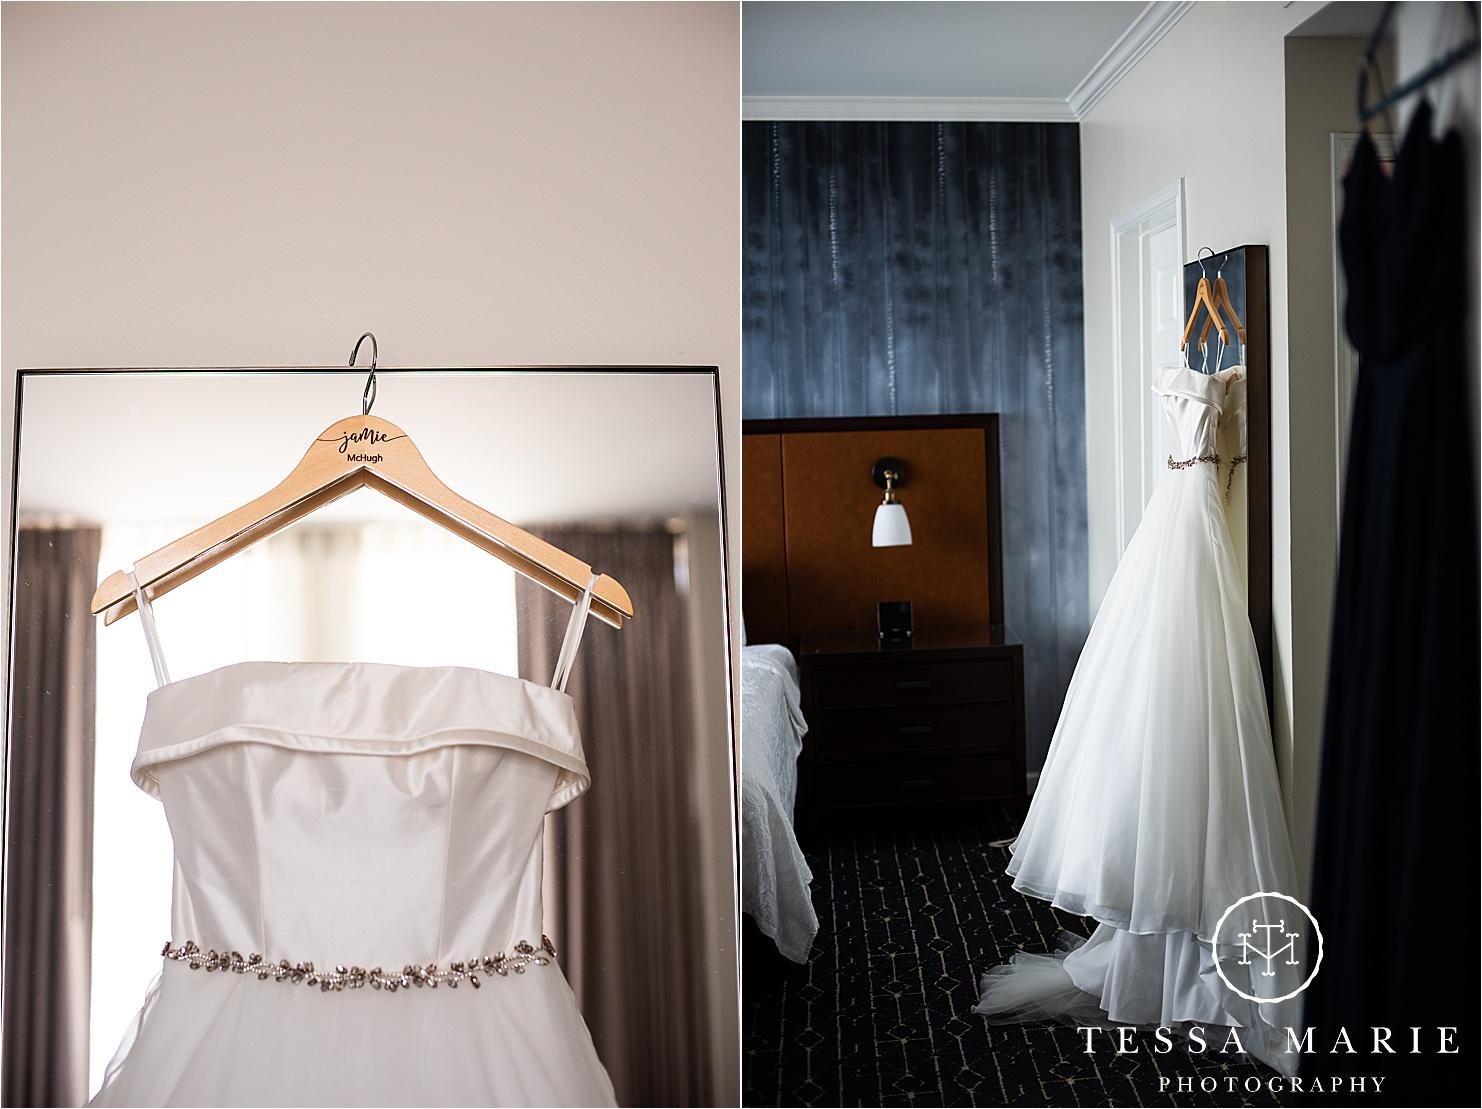 Tessa_marie_weddings_houston_wedding_photographer_The_astorian_0006.jpg